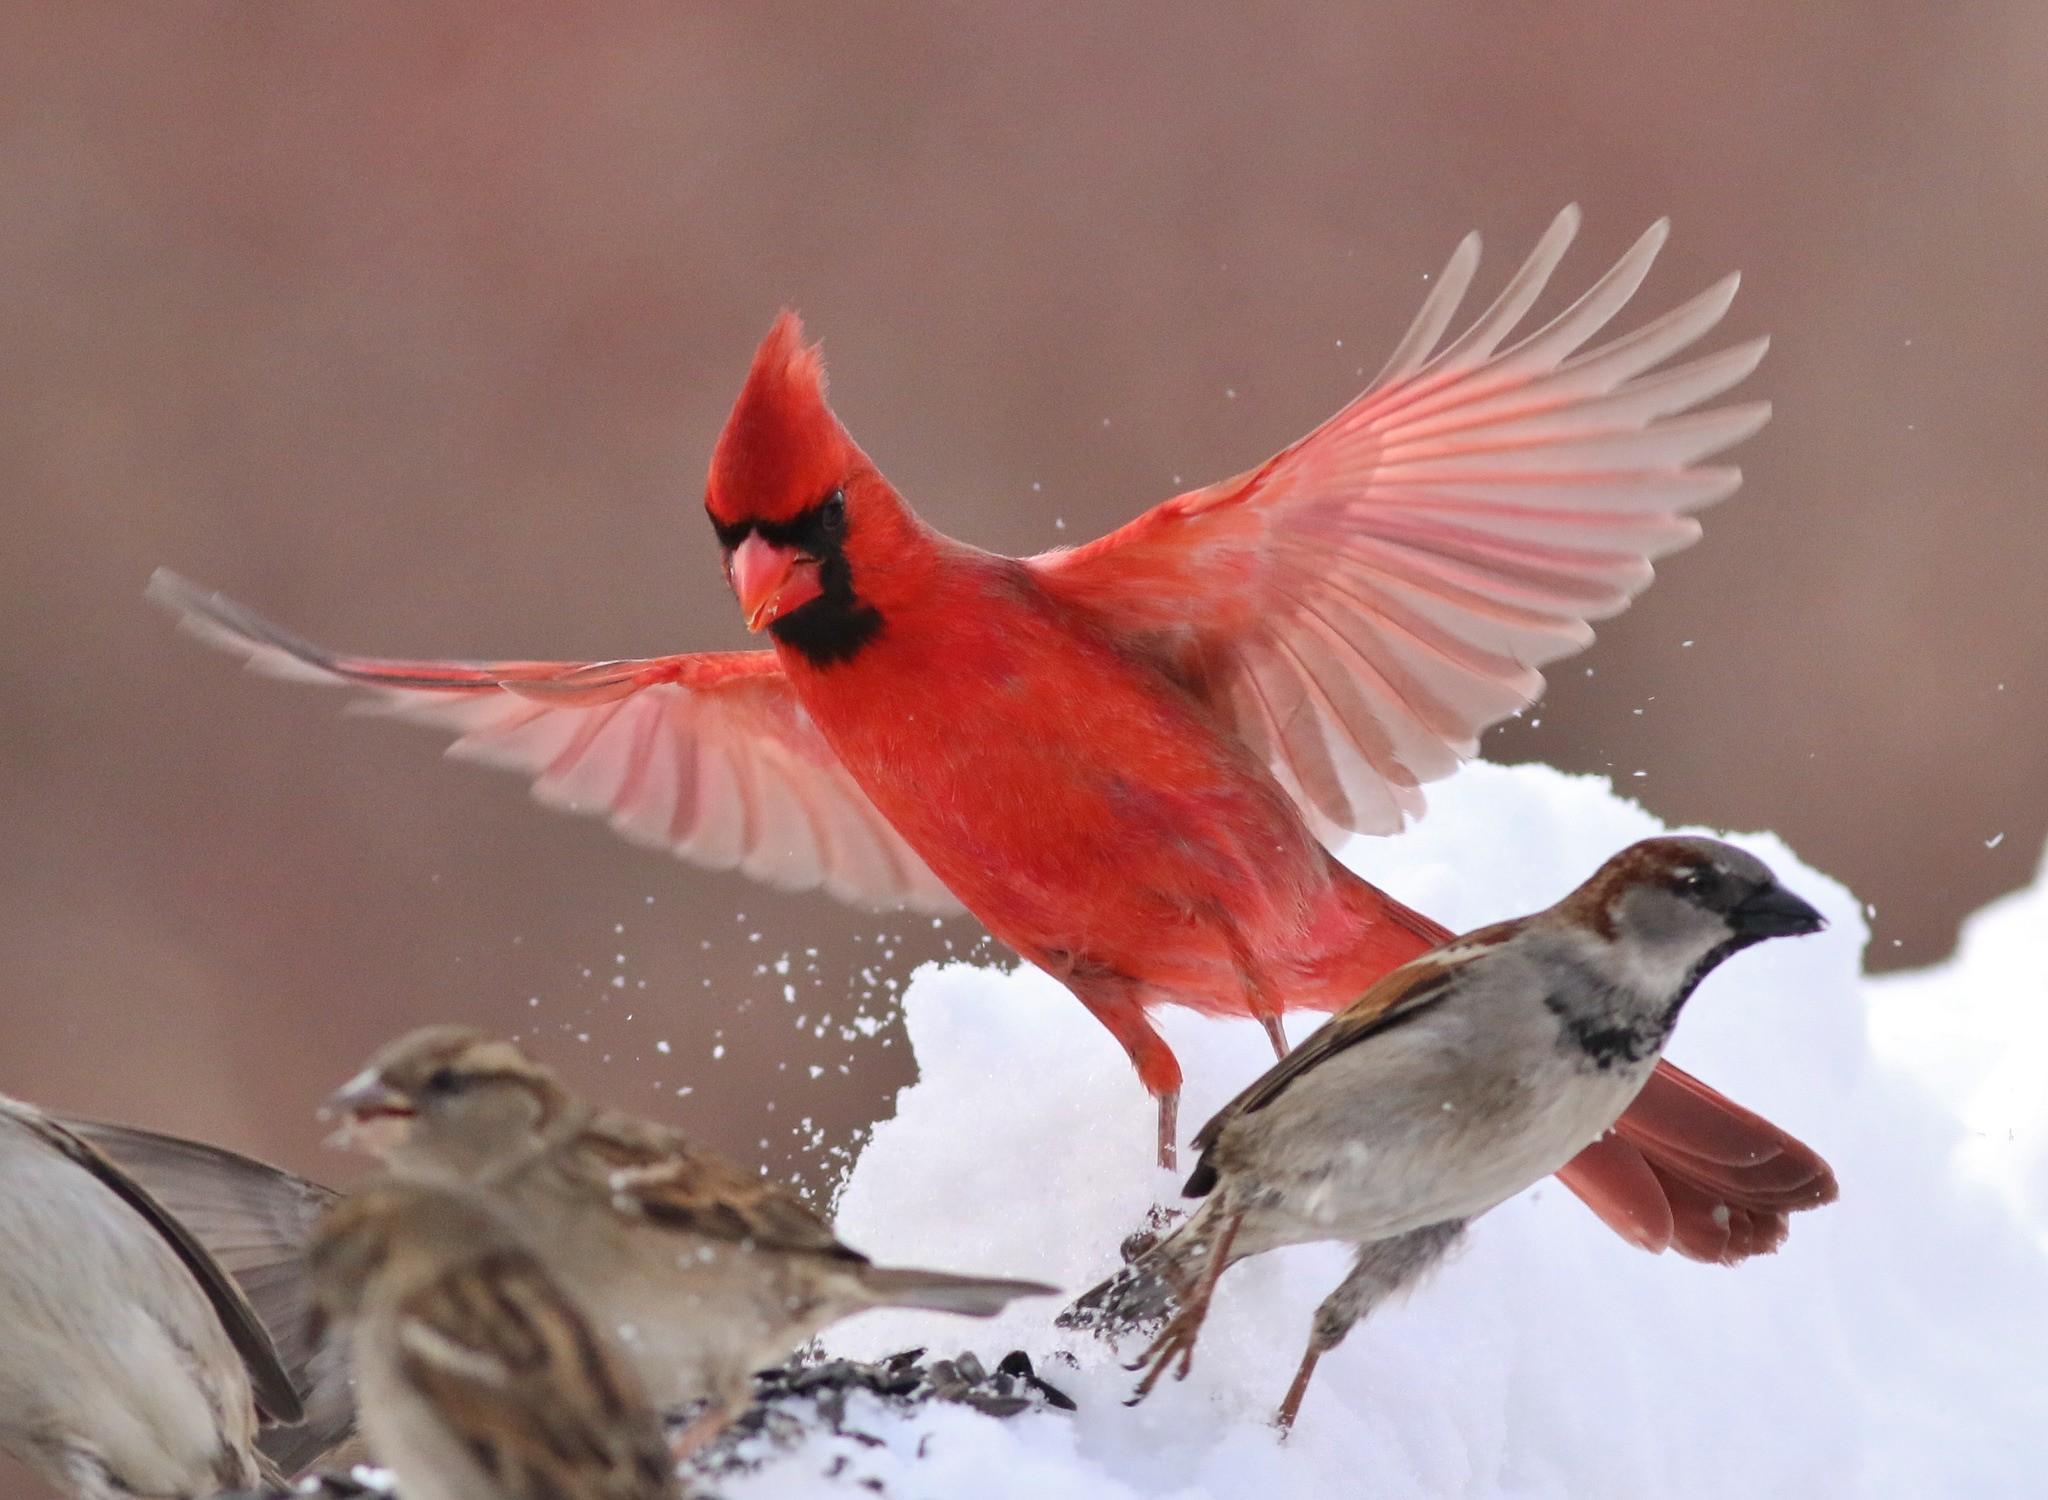 cardinal birds in snow wallpaper 47 images